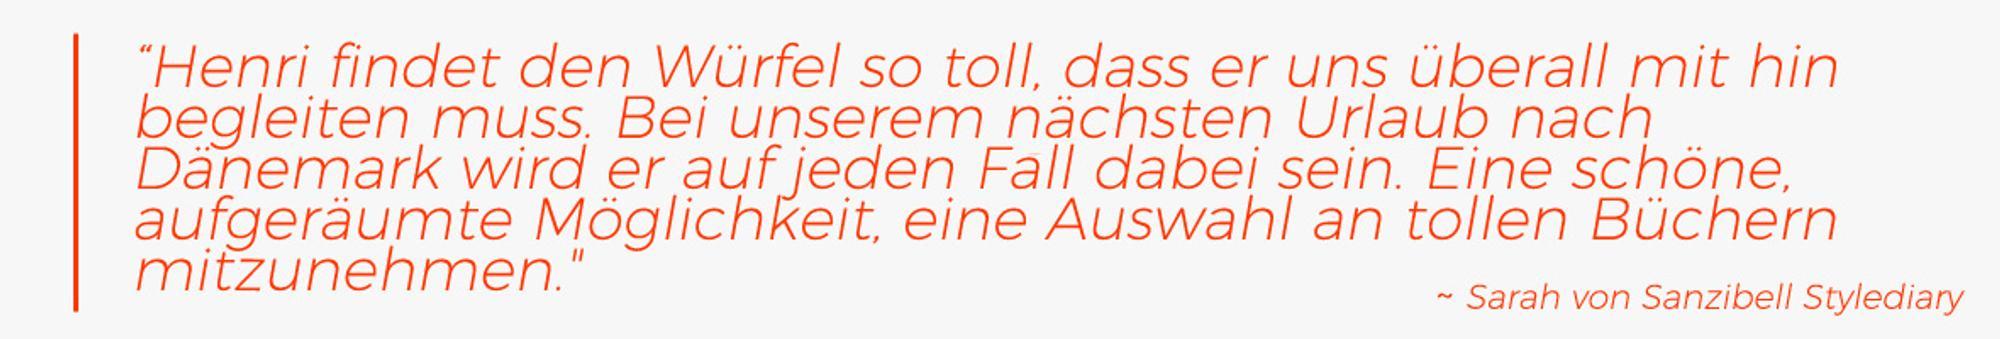 Zitat Sarah von Sanzibell Stylediary über den Ravensburger Bücher-Würfel